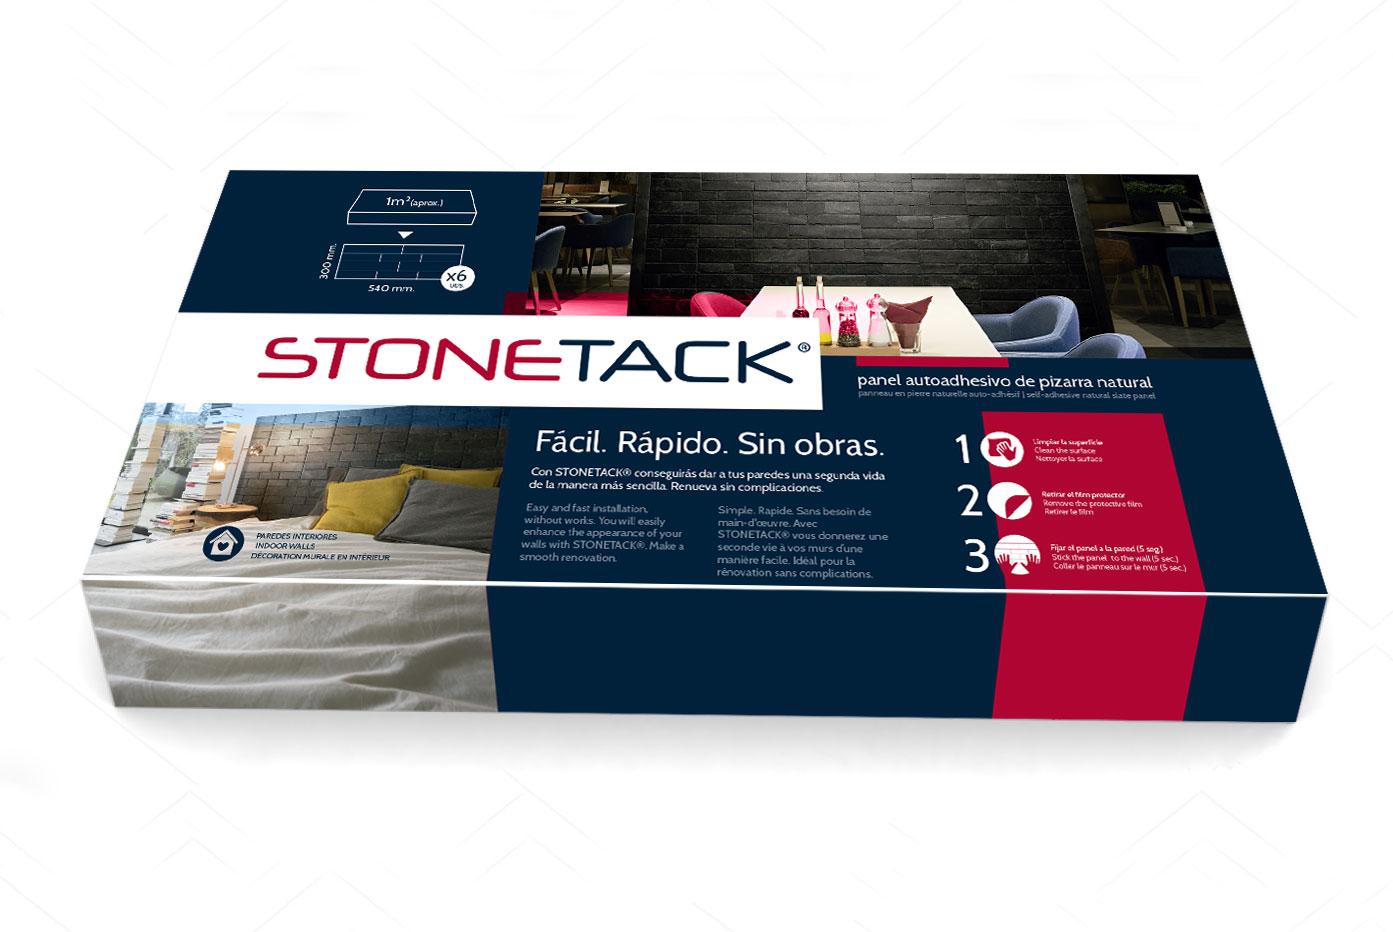 Caja Stonetack®